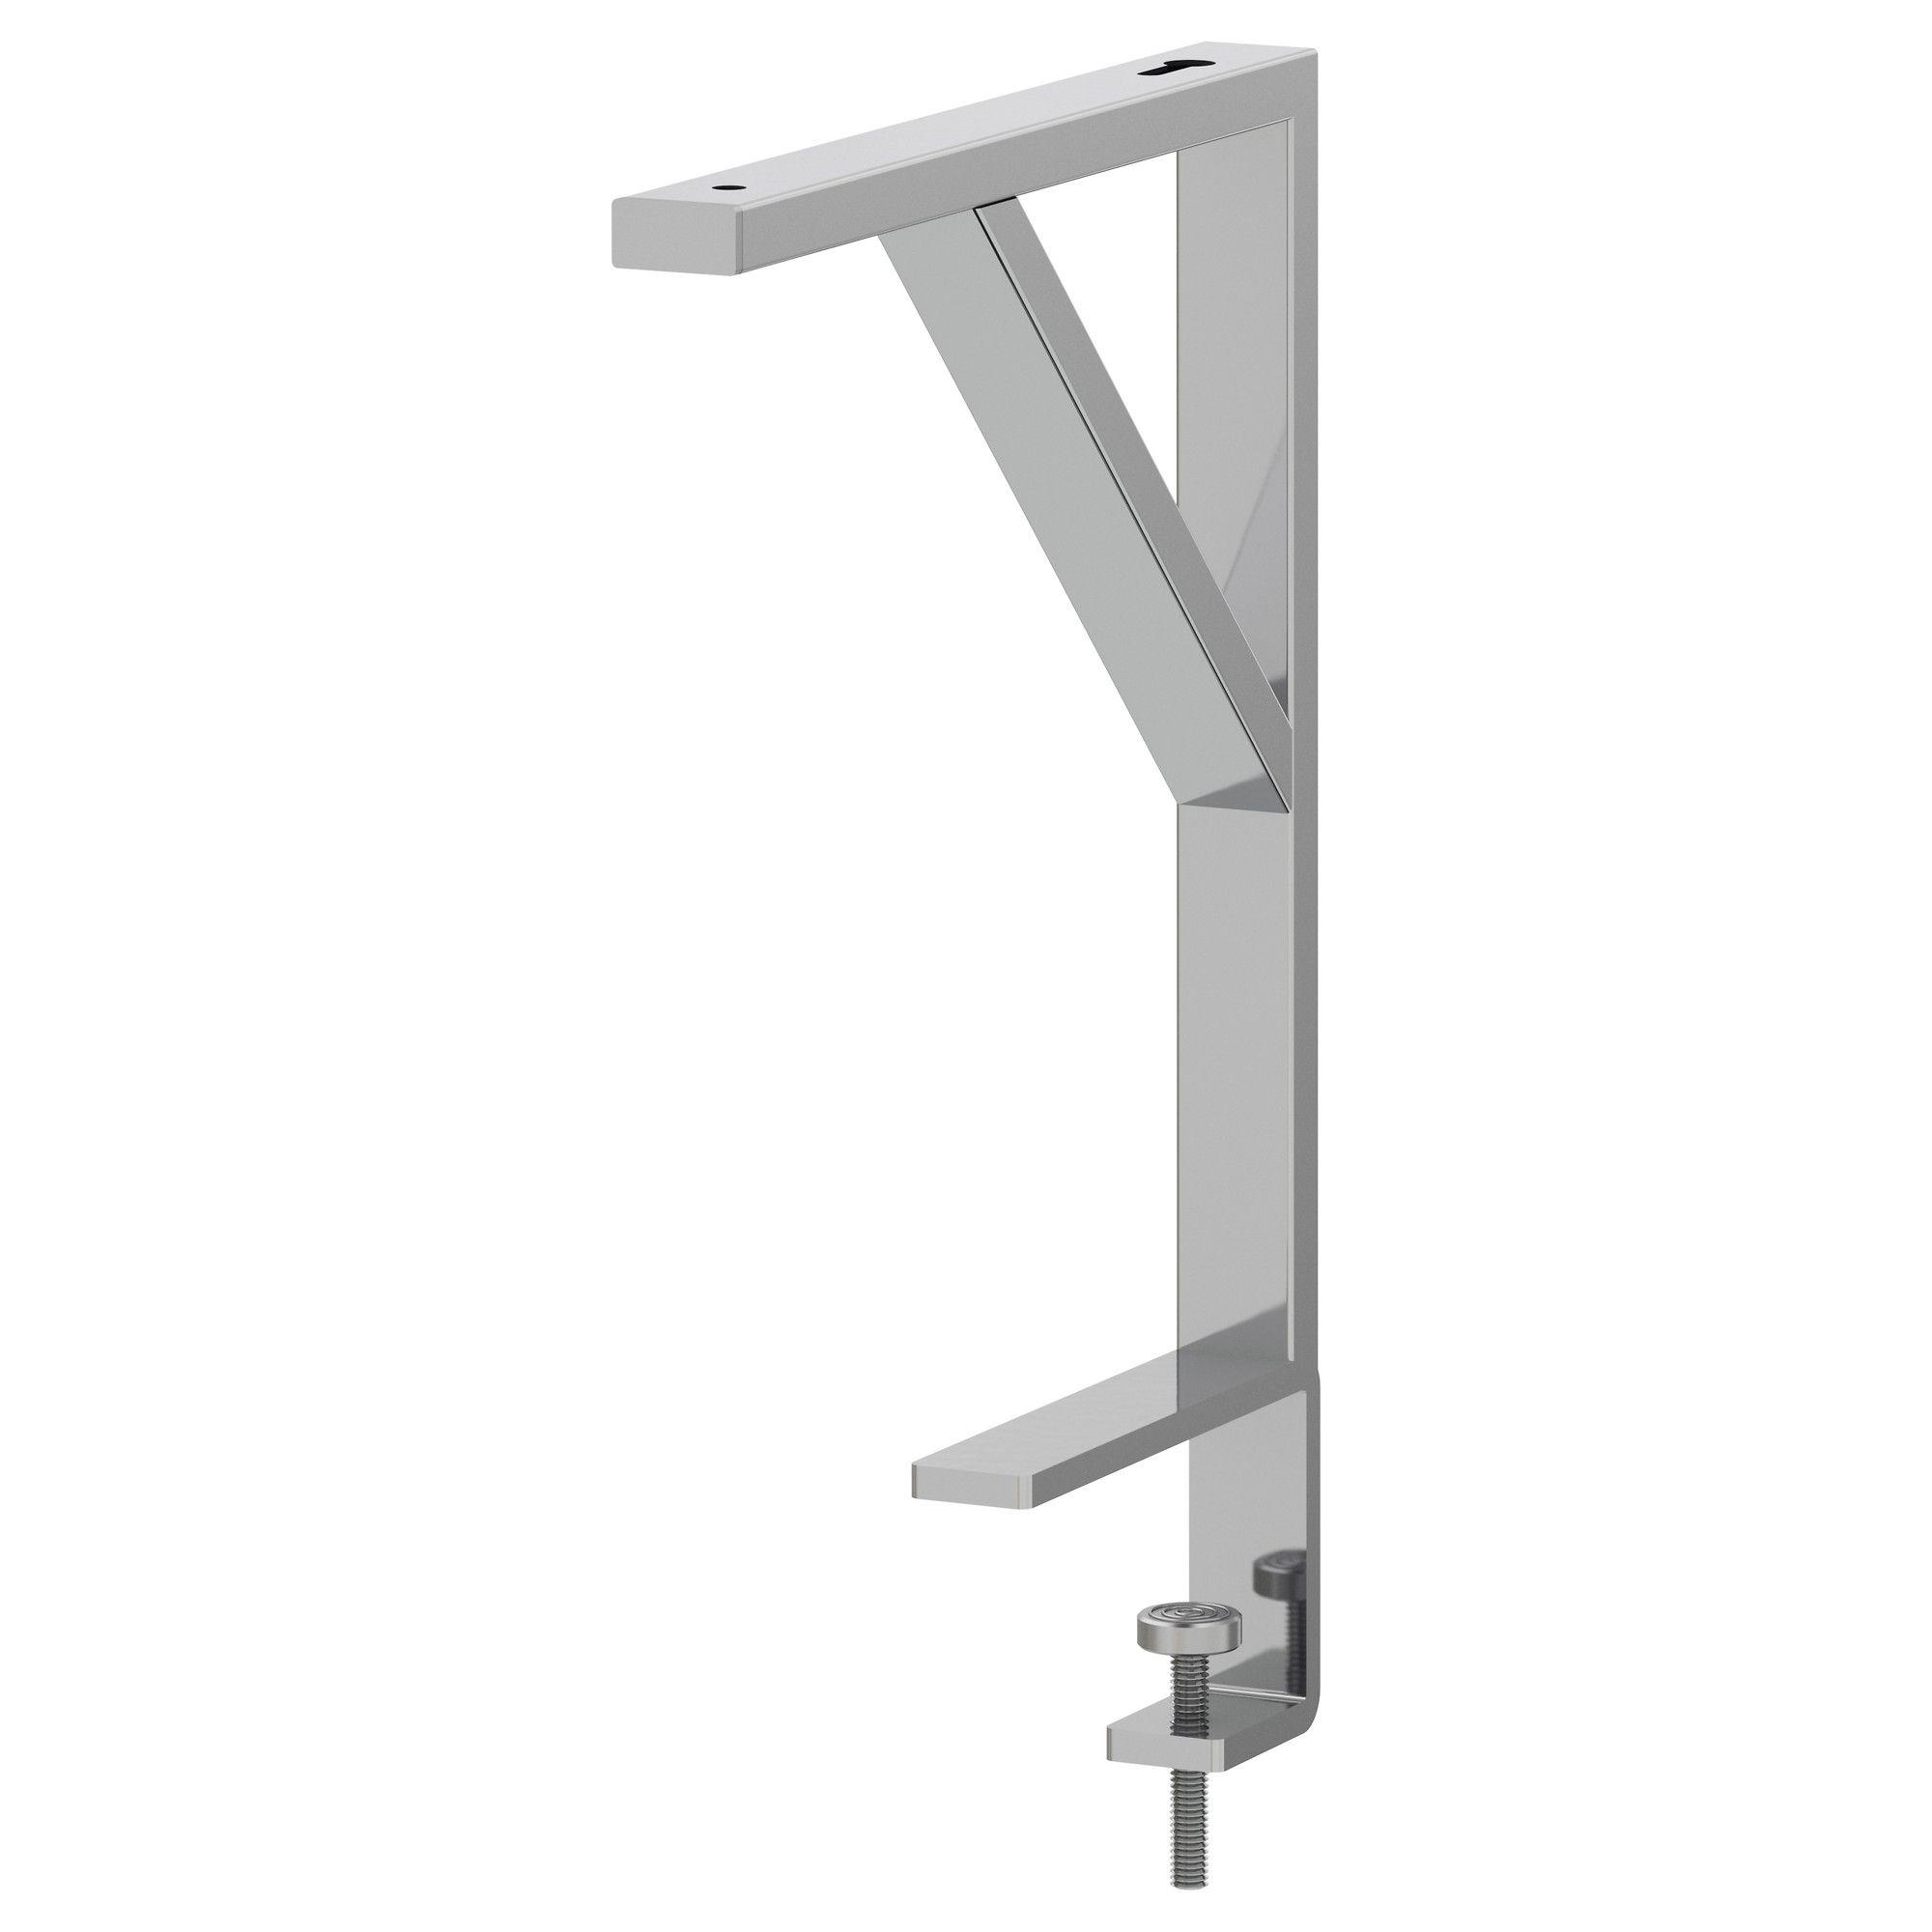 Ikea Tafelblad Wit.Ekby Tore Console Voor Tafelblad Wit Ikea Binnen